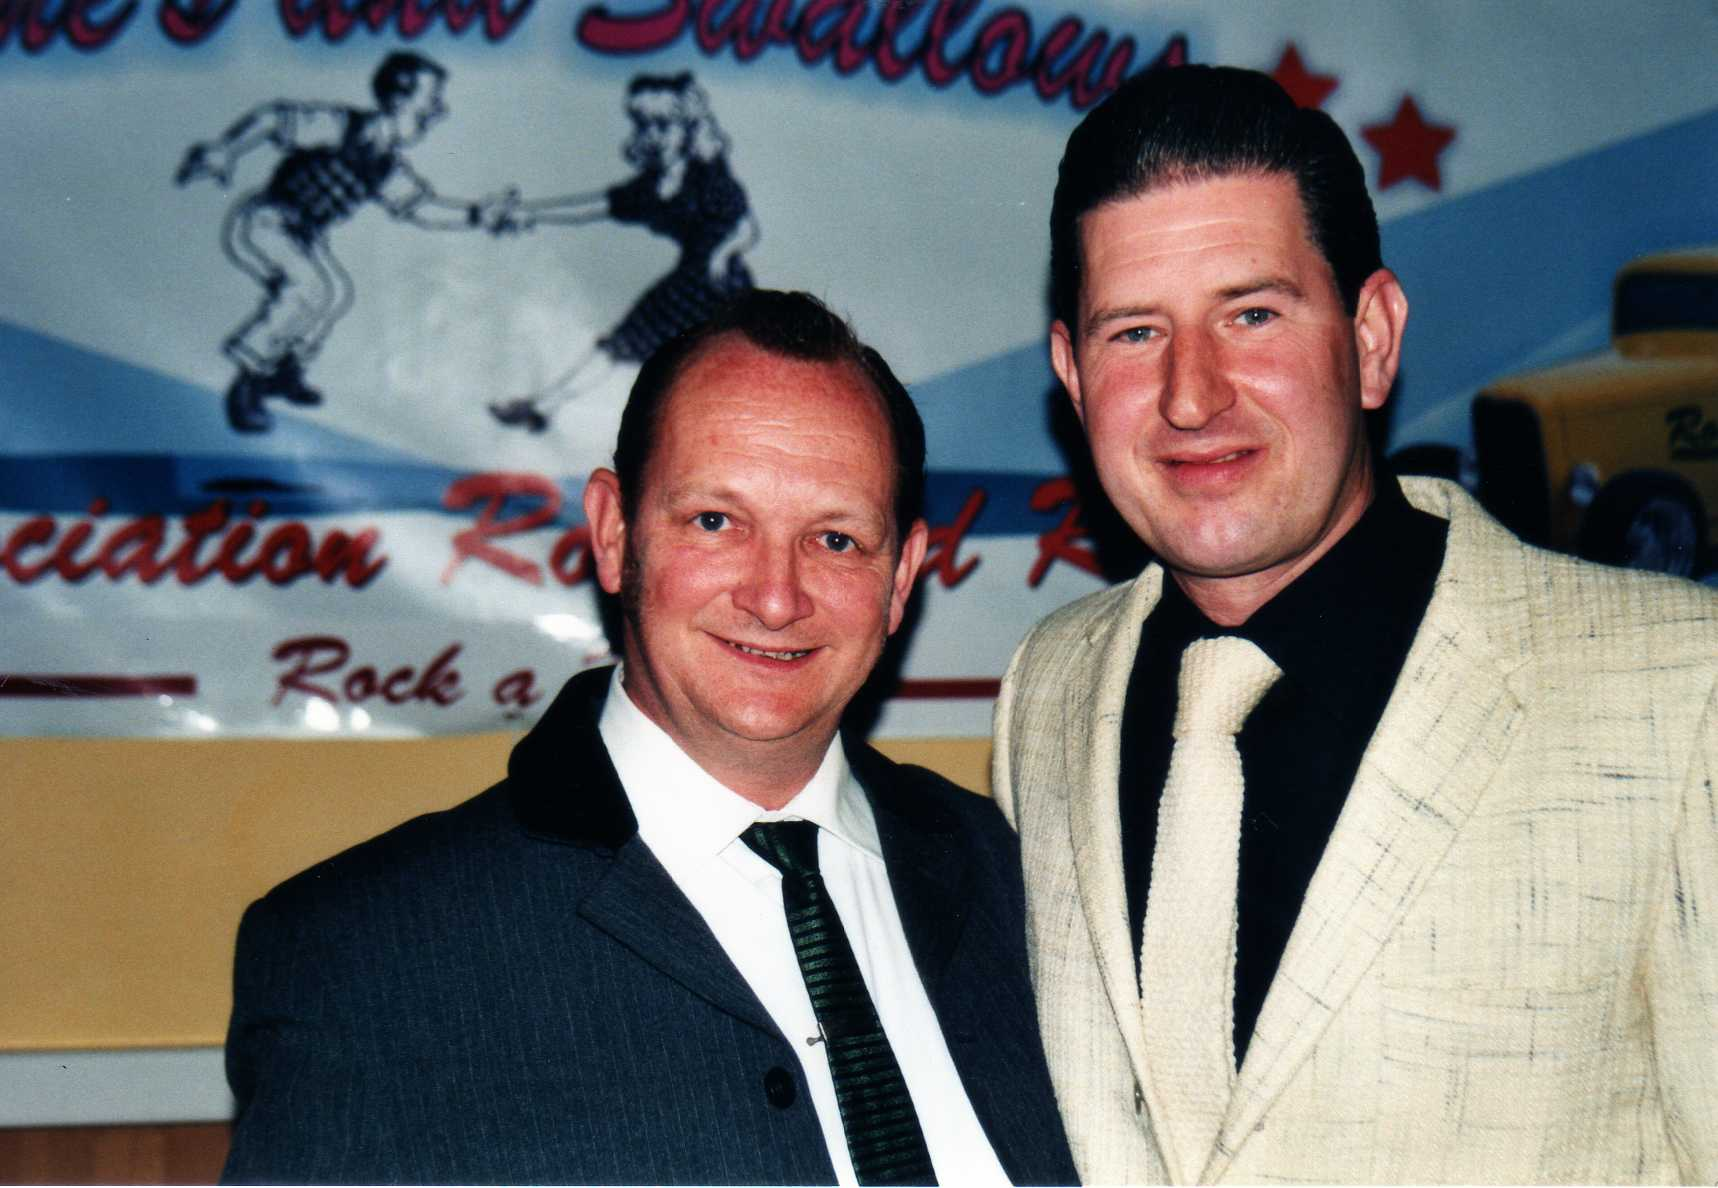 Charlie Thompson & I - May 19, 2012